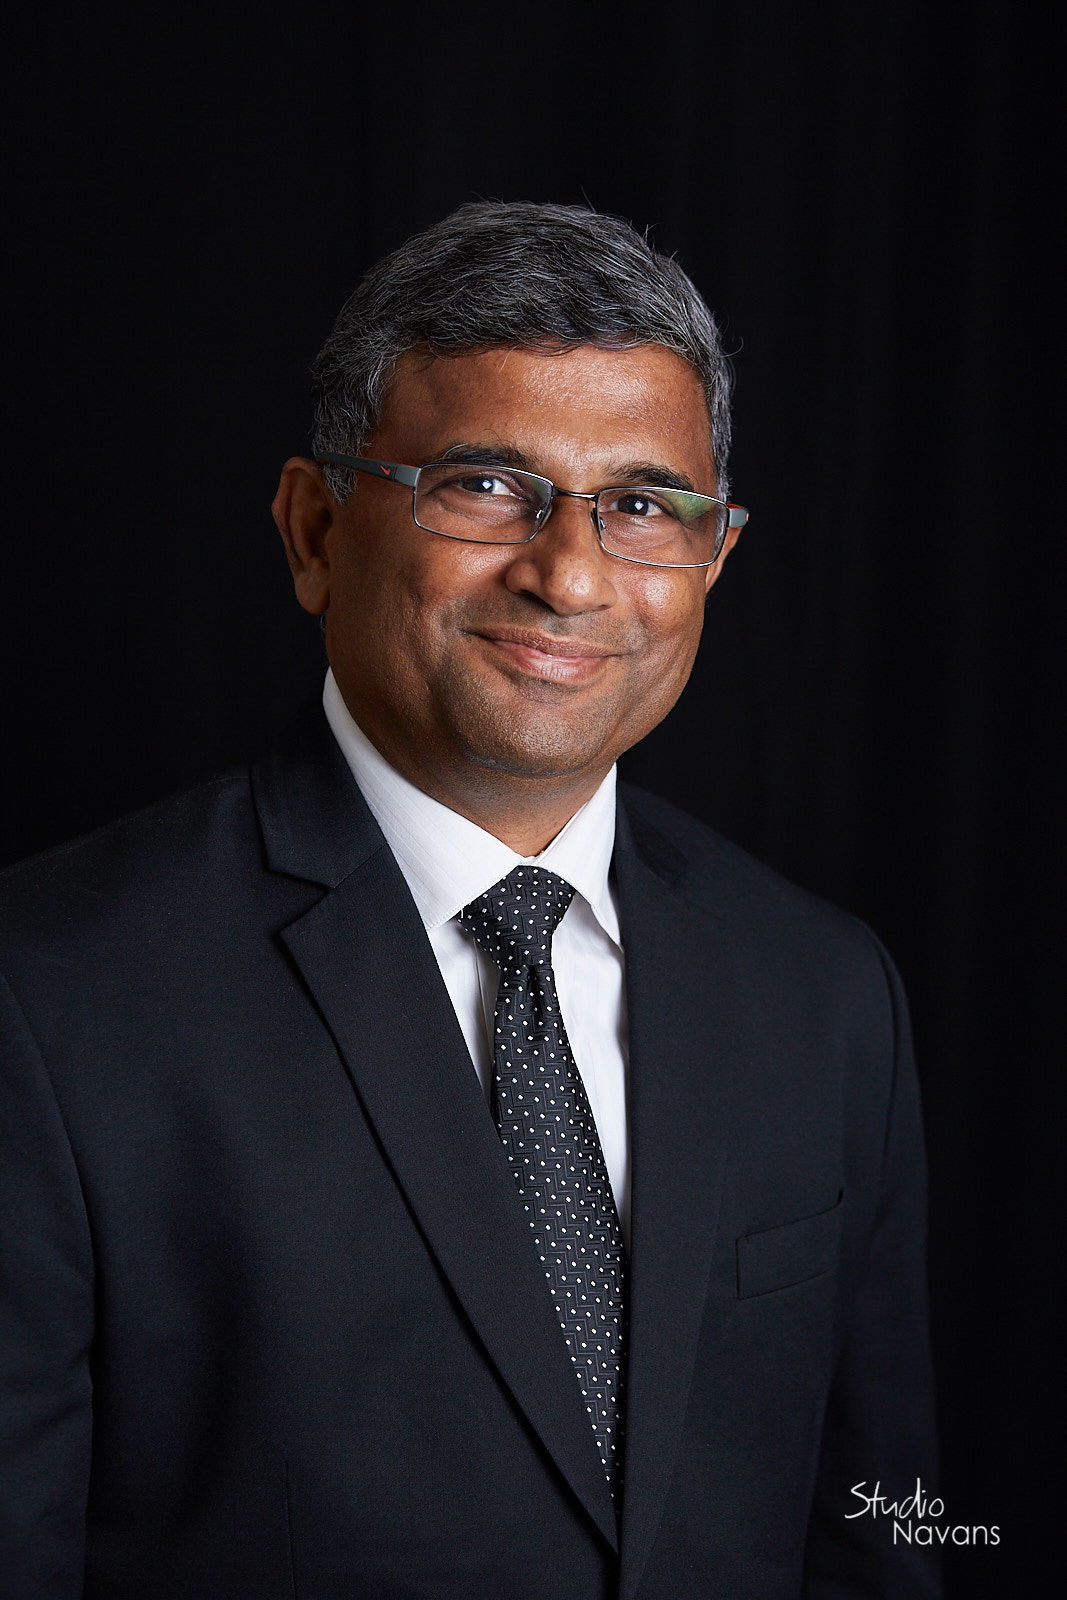 Business Portrait of Krishnan Naganathan by Studio Navans